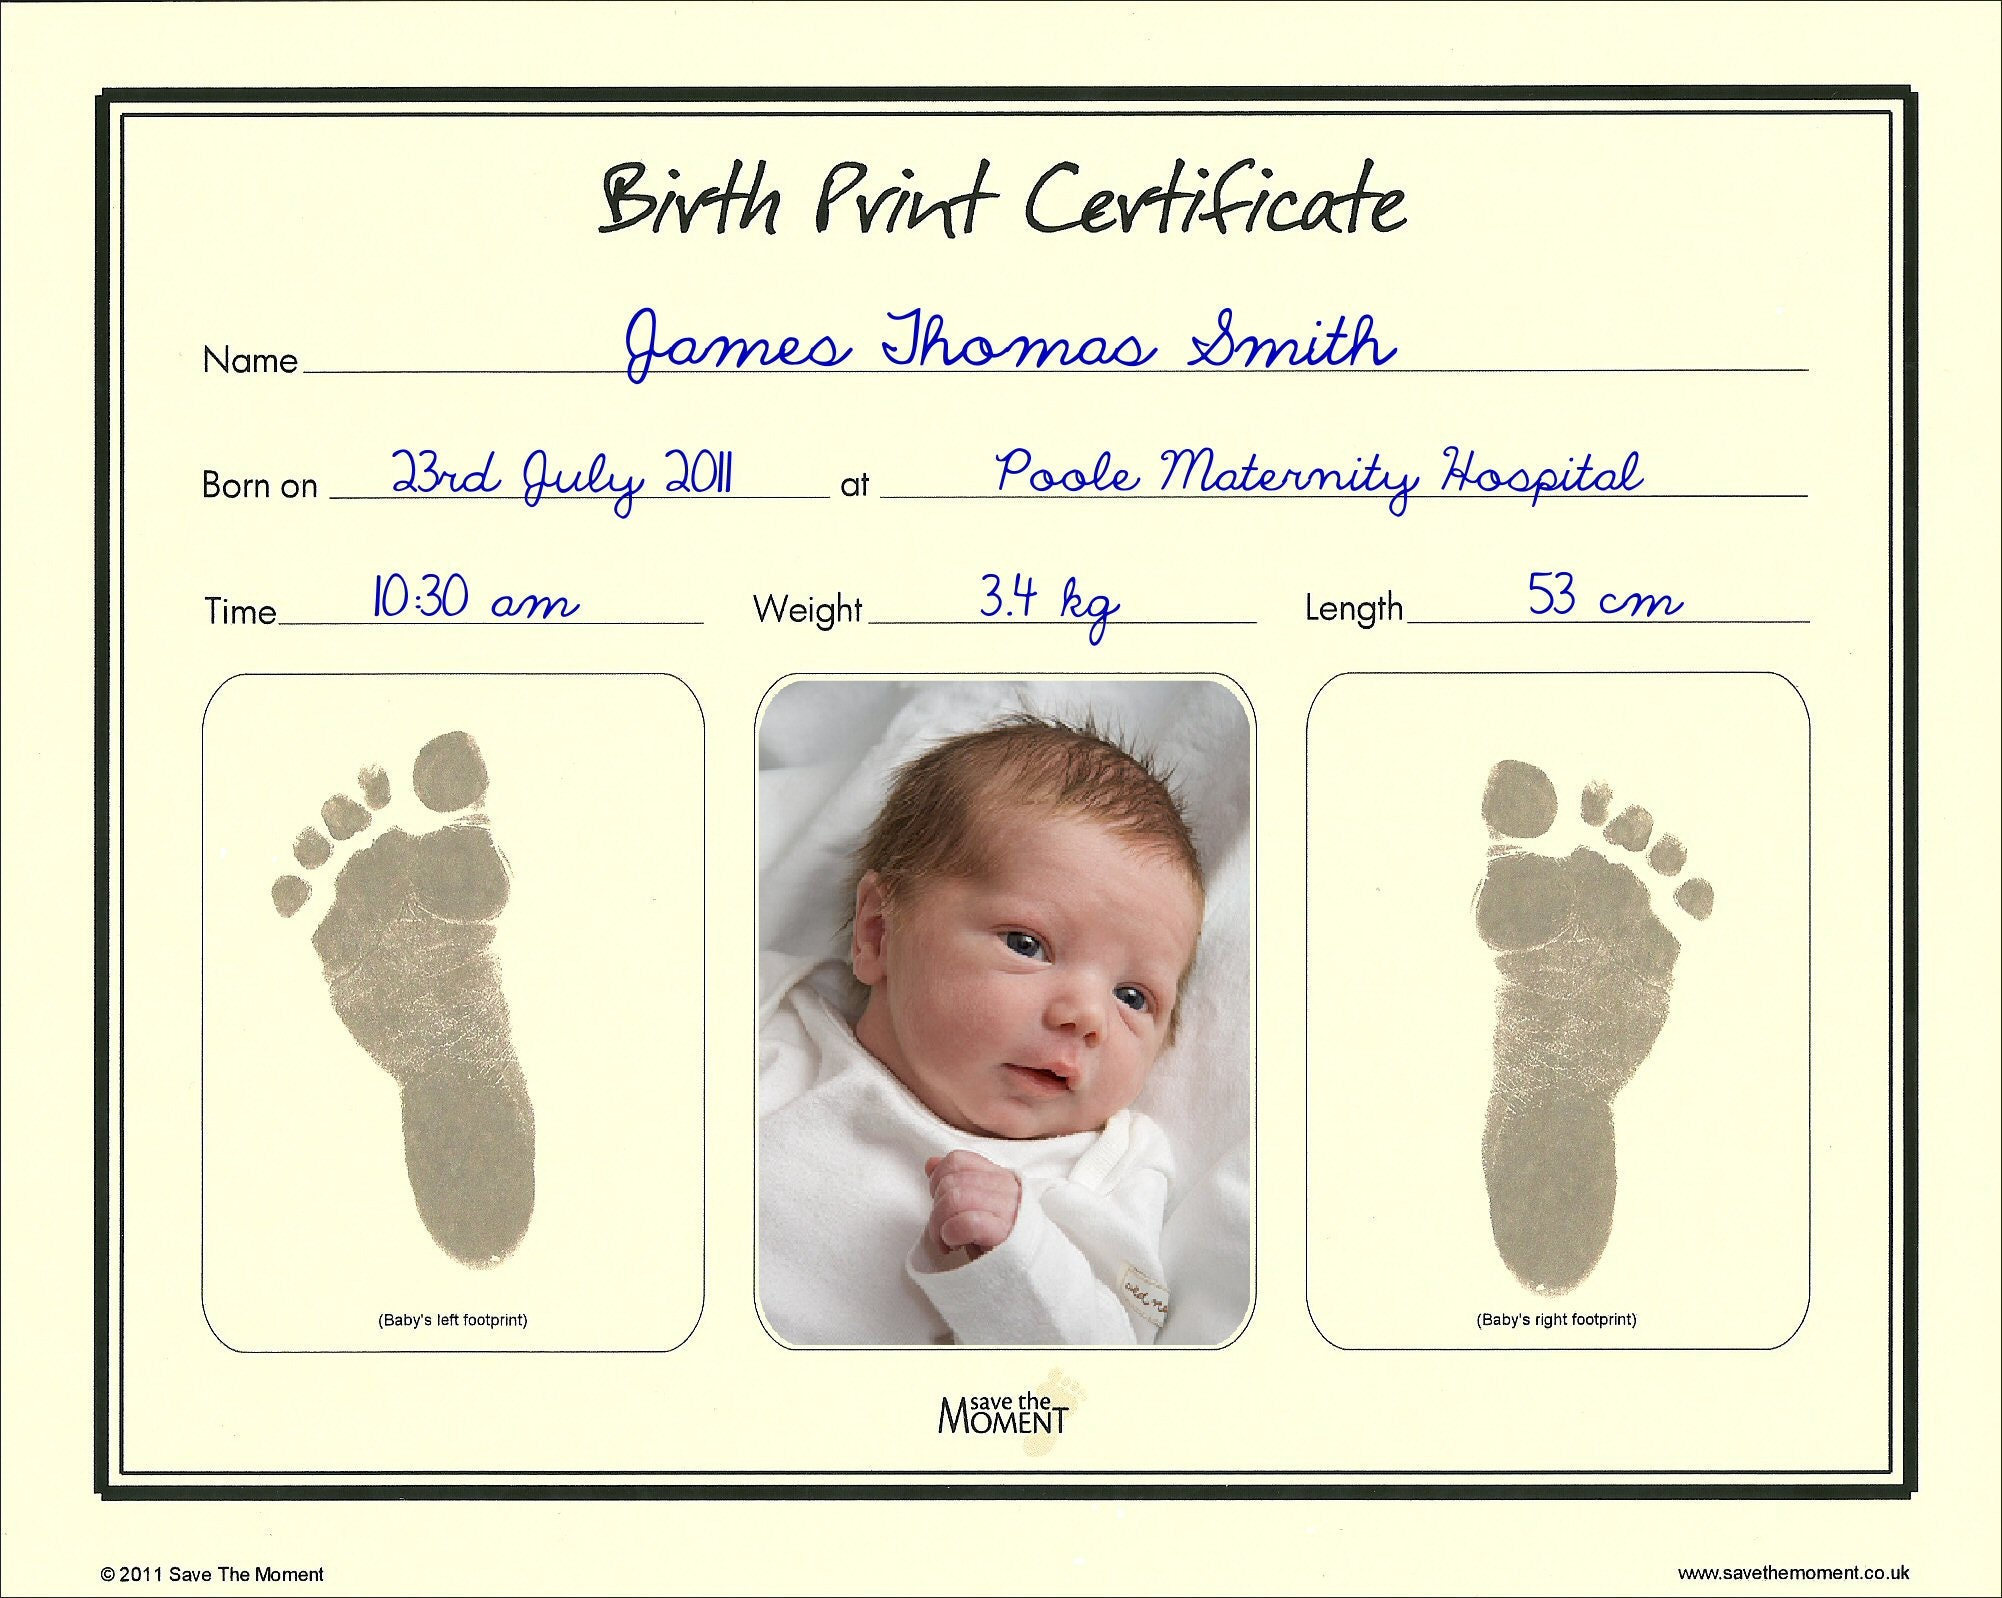 Newborn keepsake clay handprint footprint and inkless birth newborn keepsake clay handprint footprint and inkless birth certificate gift set sold by savethemoment aiddatafo Images